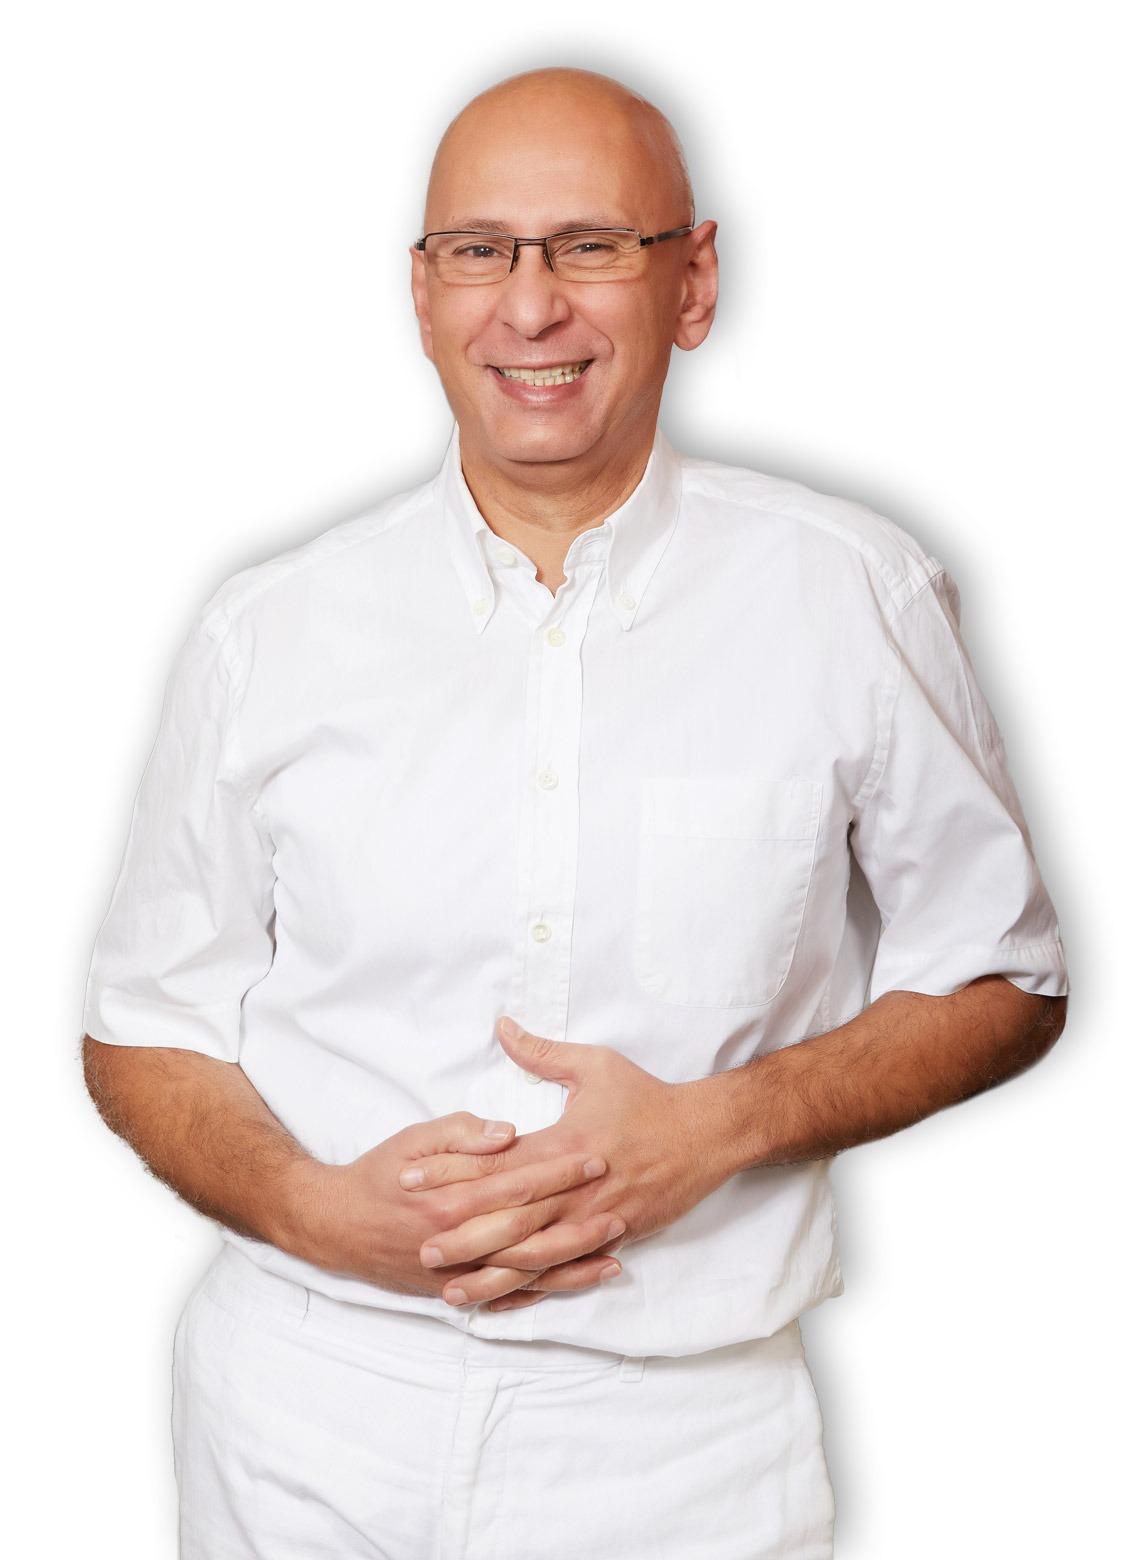 Zahnarzt Köln: Dr. Alaa Narouz